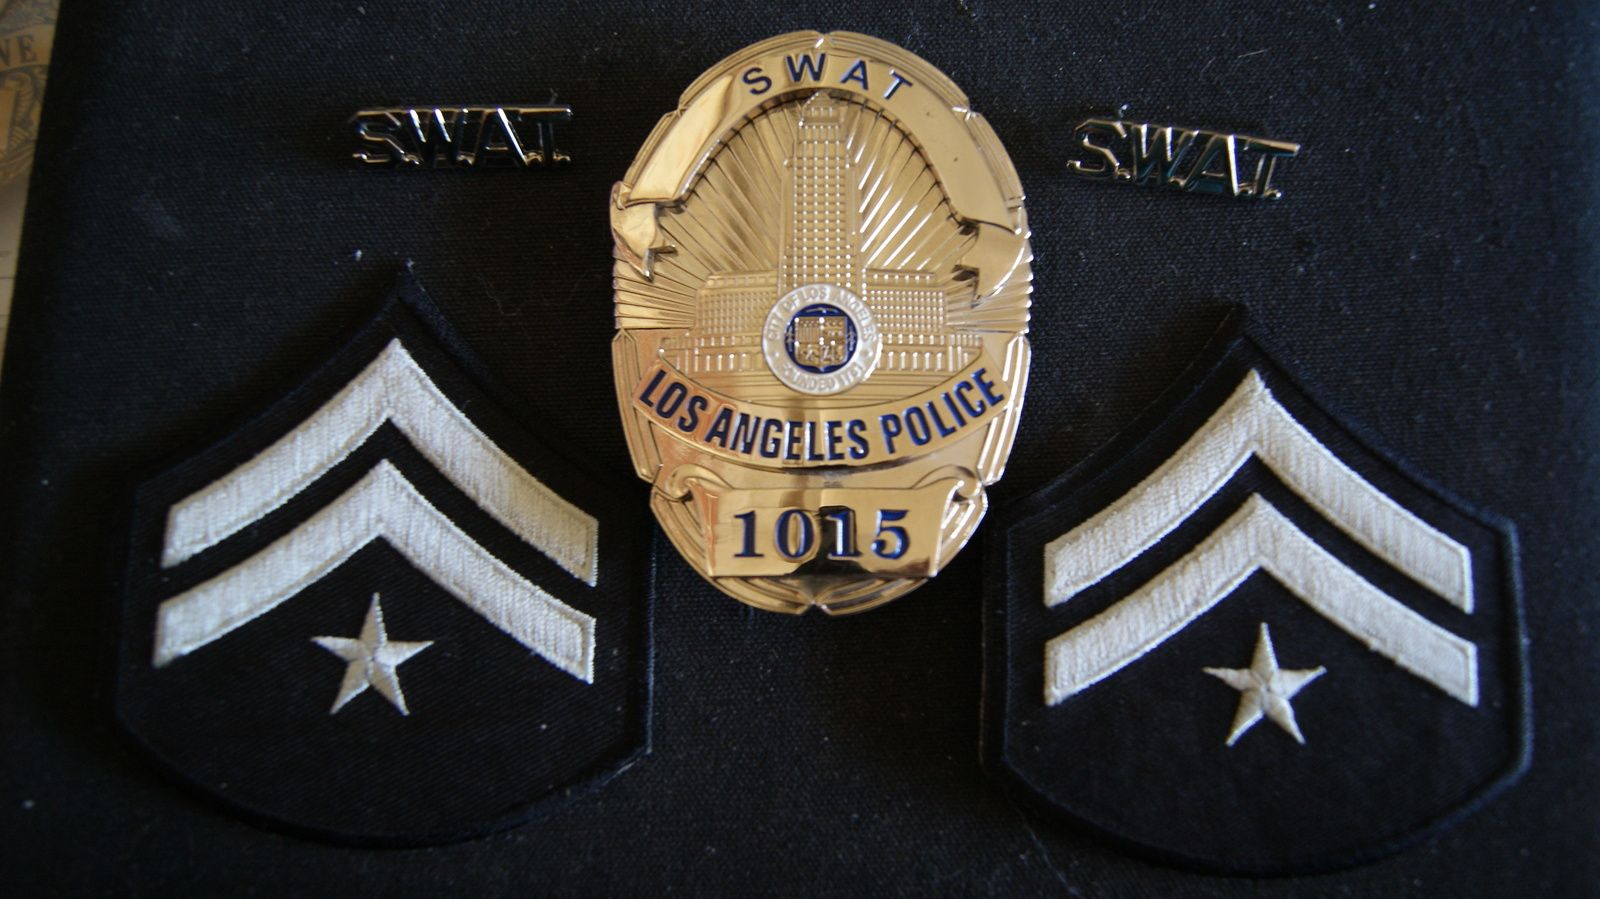 Los Angeles Police Badge Swat Presentation And 50 Similar Items Police Badge Badge Police